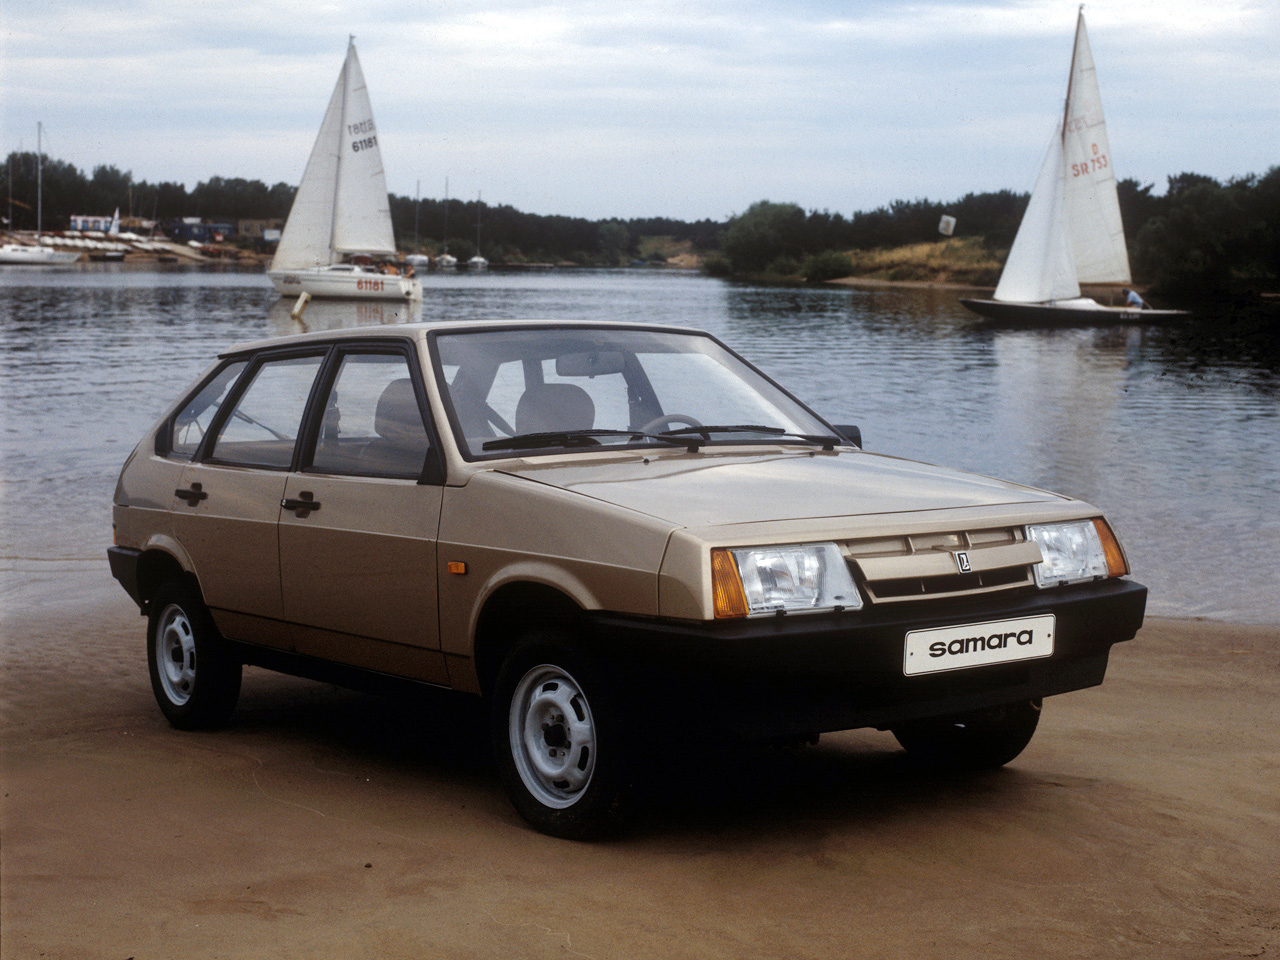 This is what my Lada Samara looked like. Stunning!